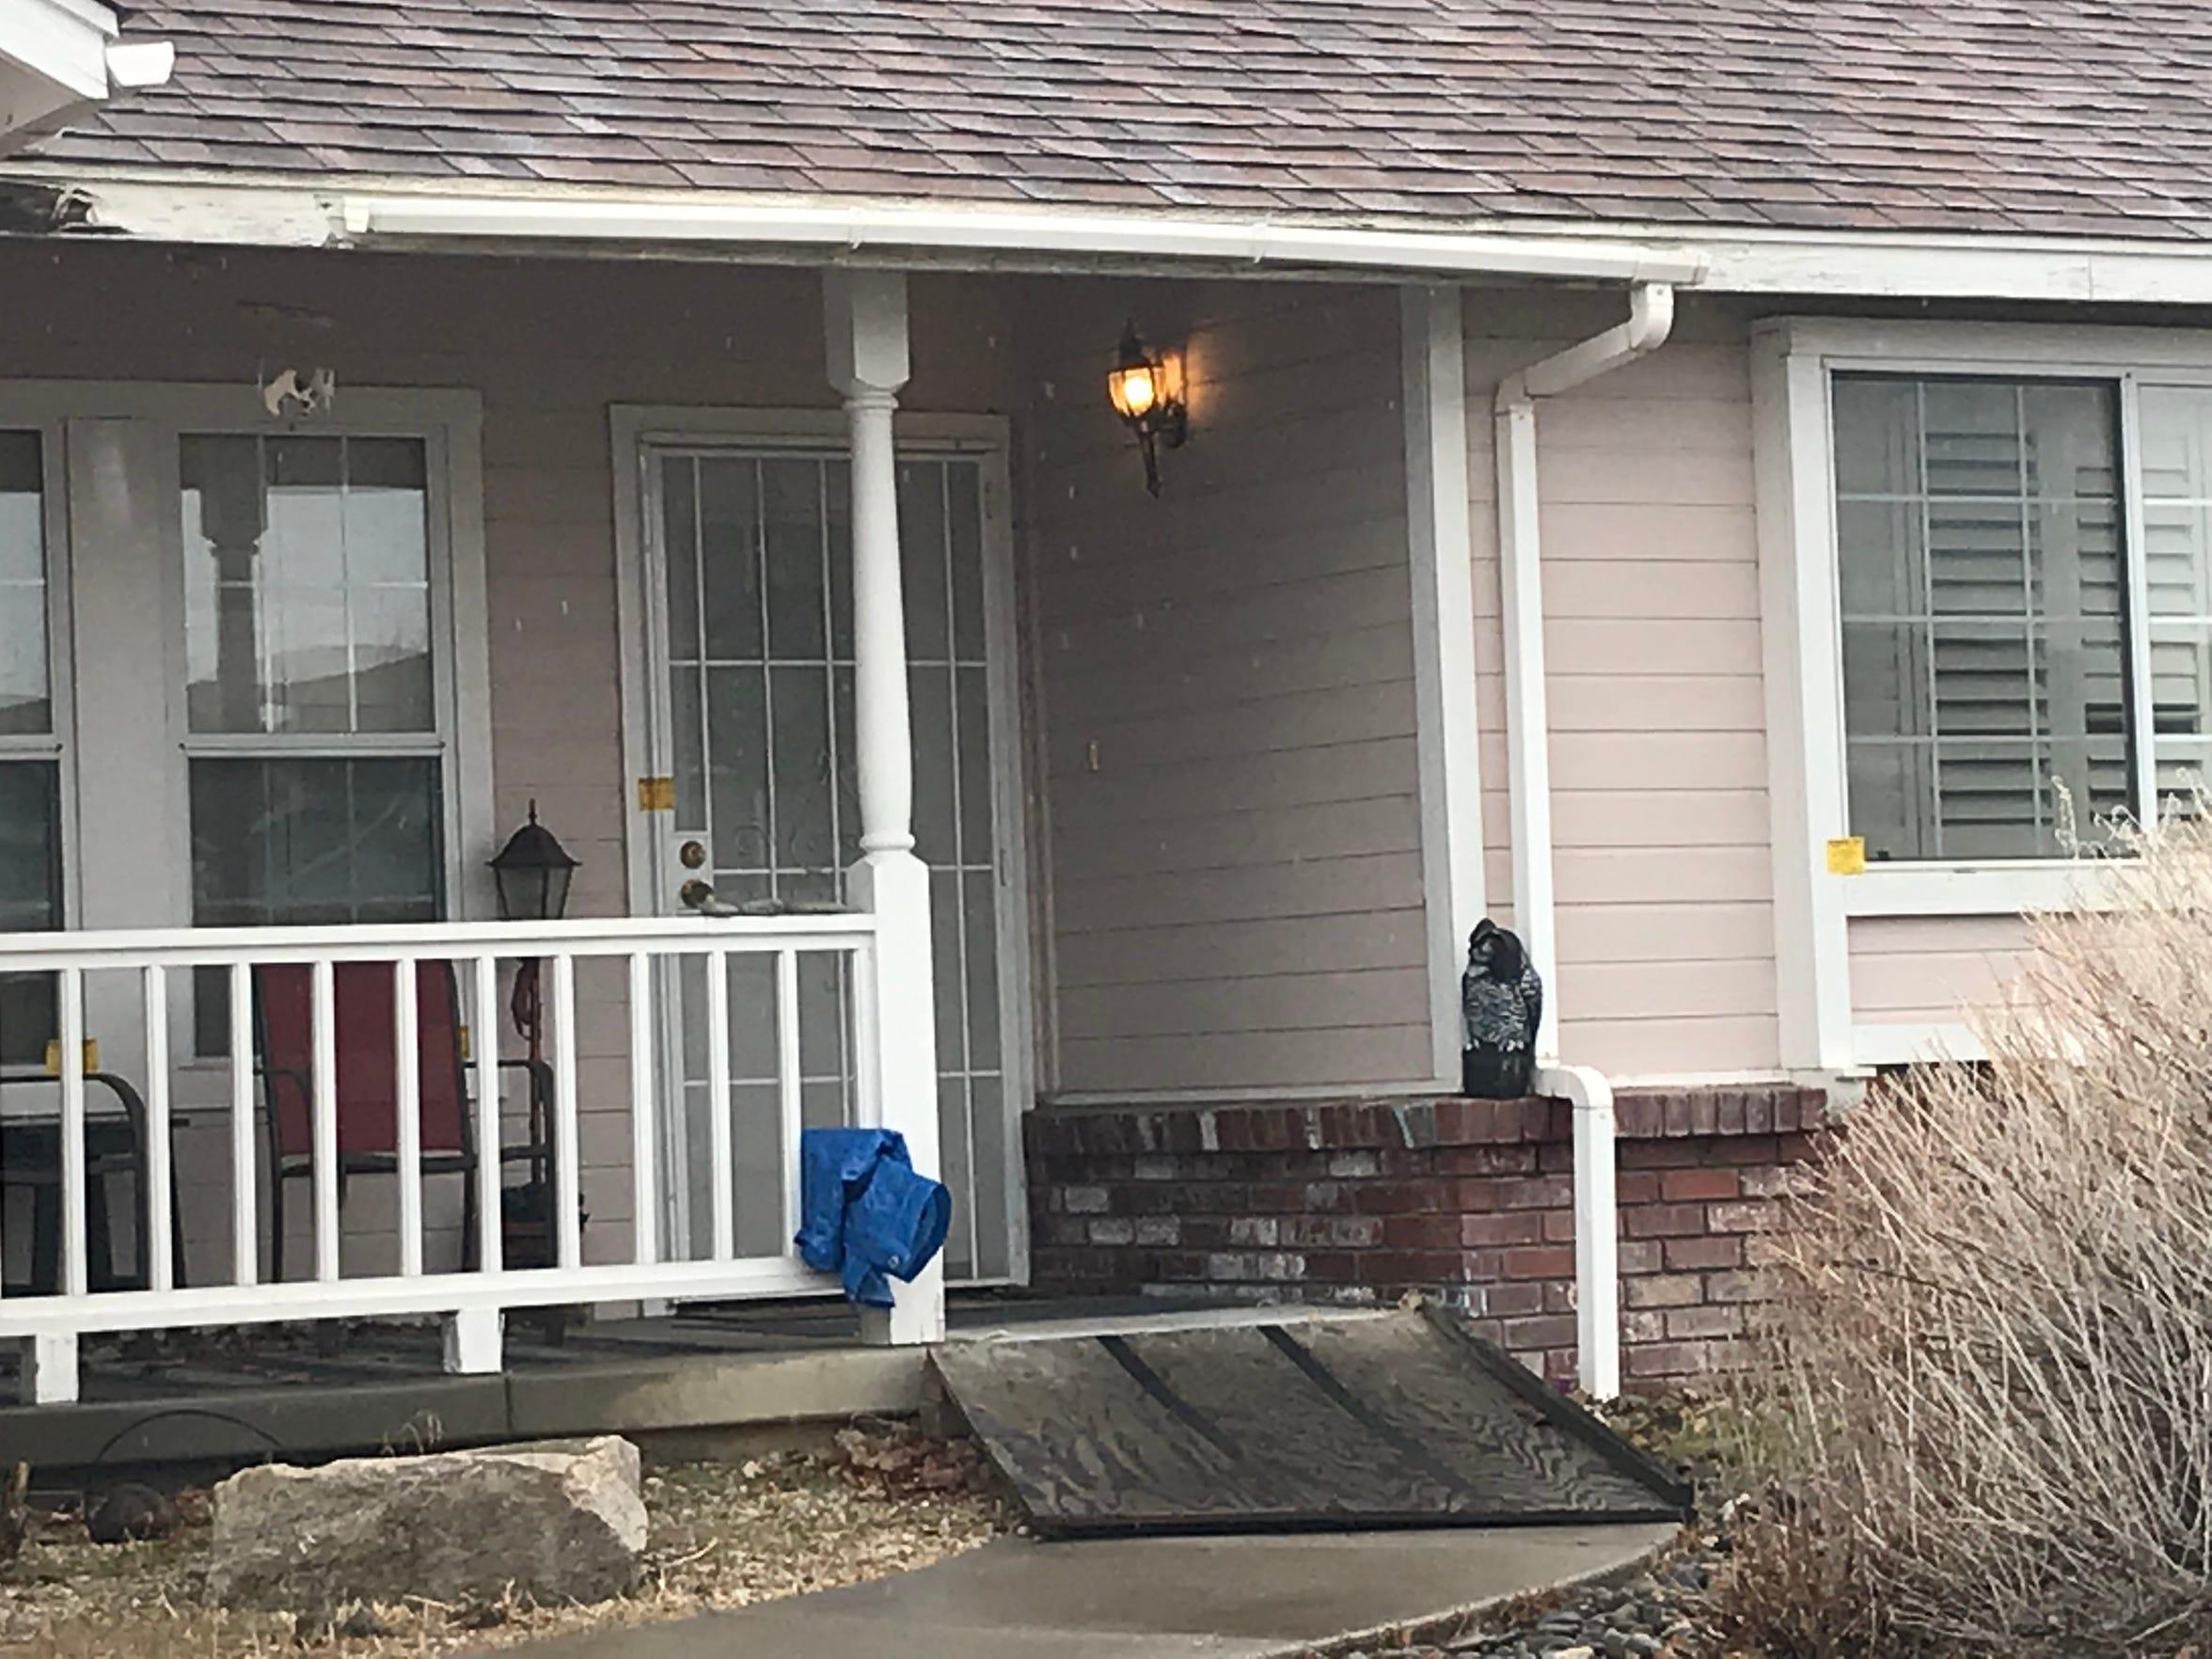 1439 James Road, Gardnerville, the home where Connie Koontz was found murdered on Jan. 10.